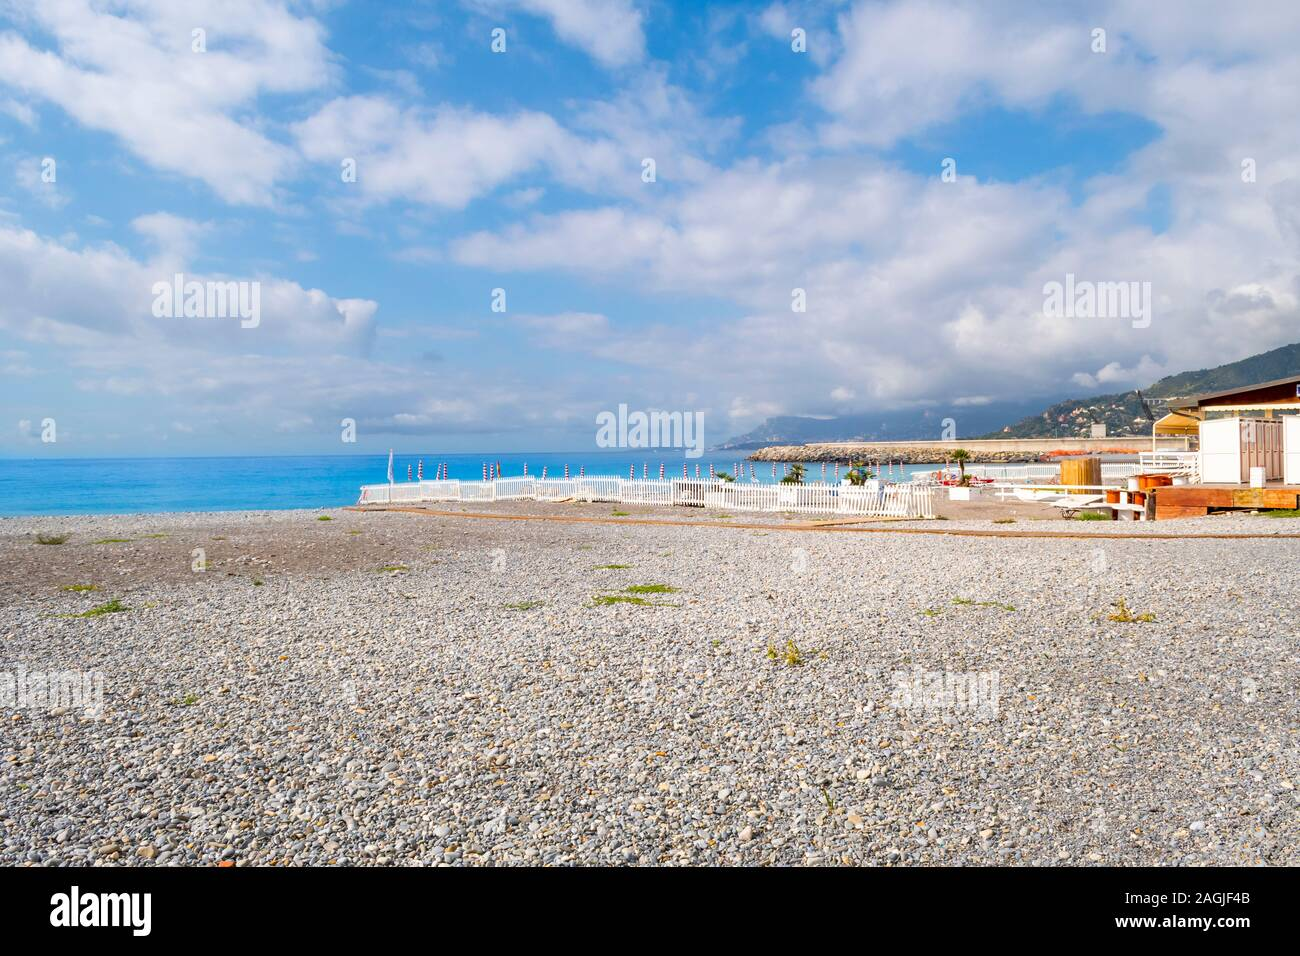 The blue Mediterranean sea, private pebble beach and seaside town of Ventimiglia, Italy, on the Italian Riviera Stock Photo